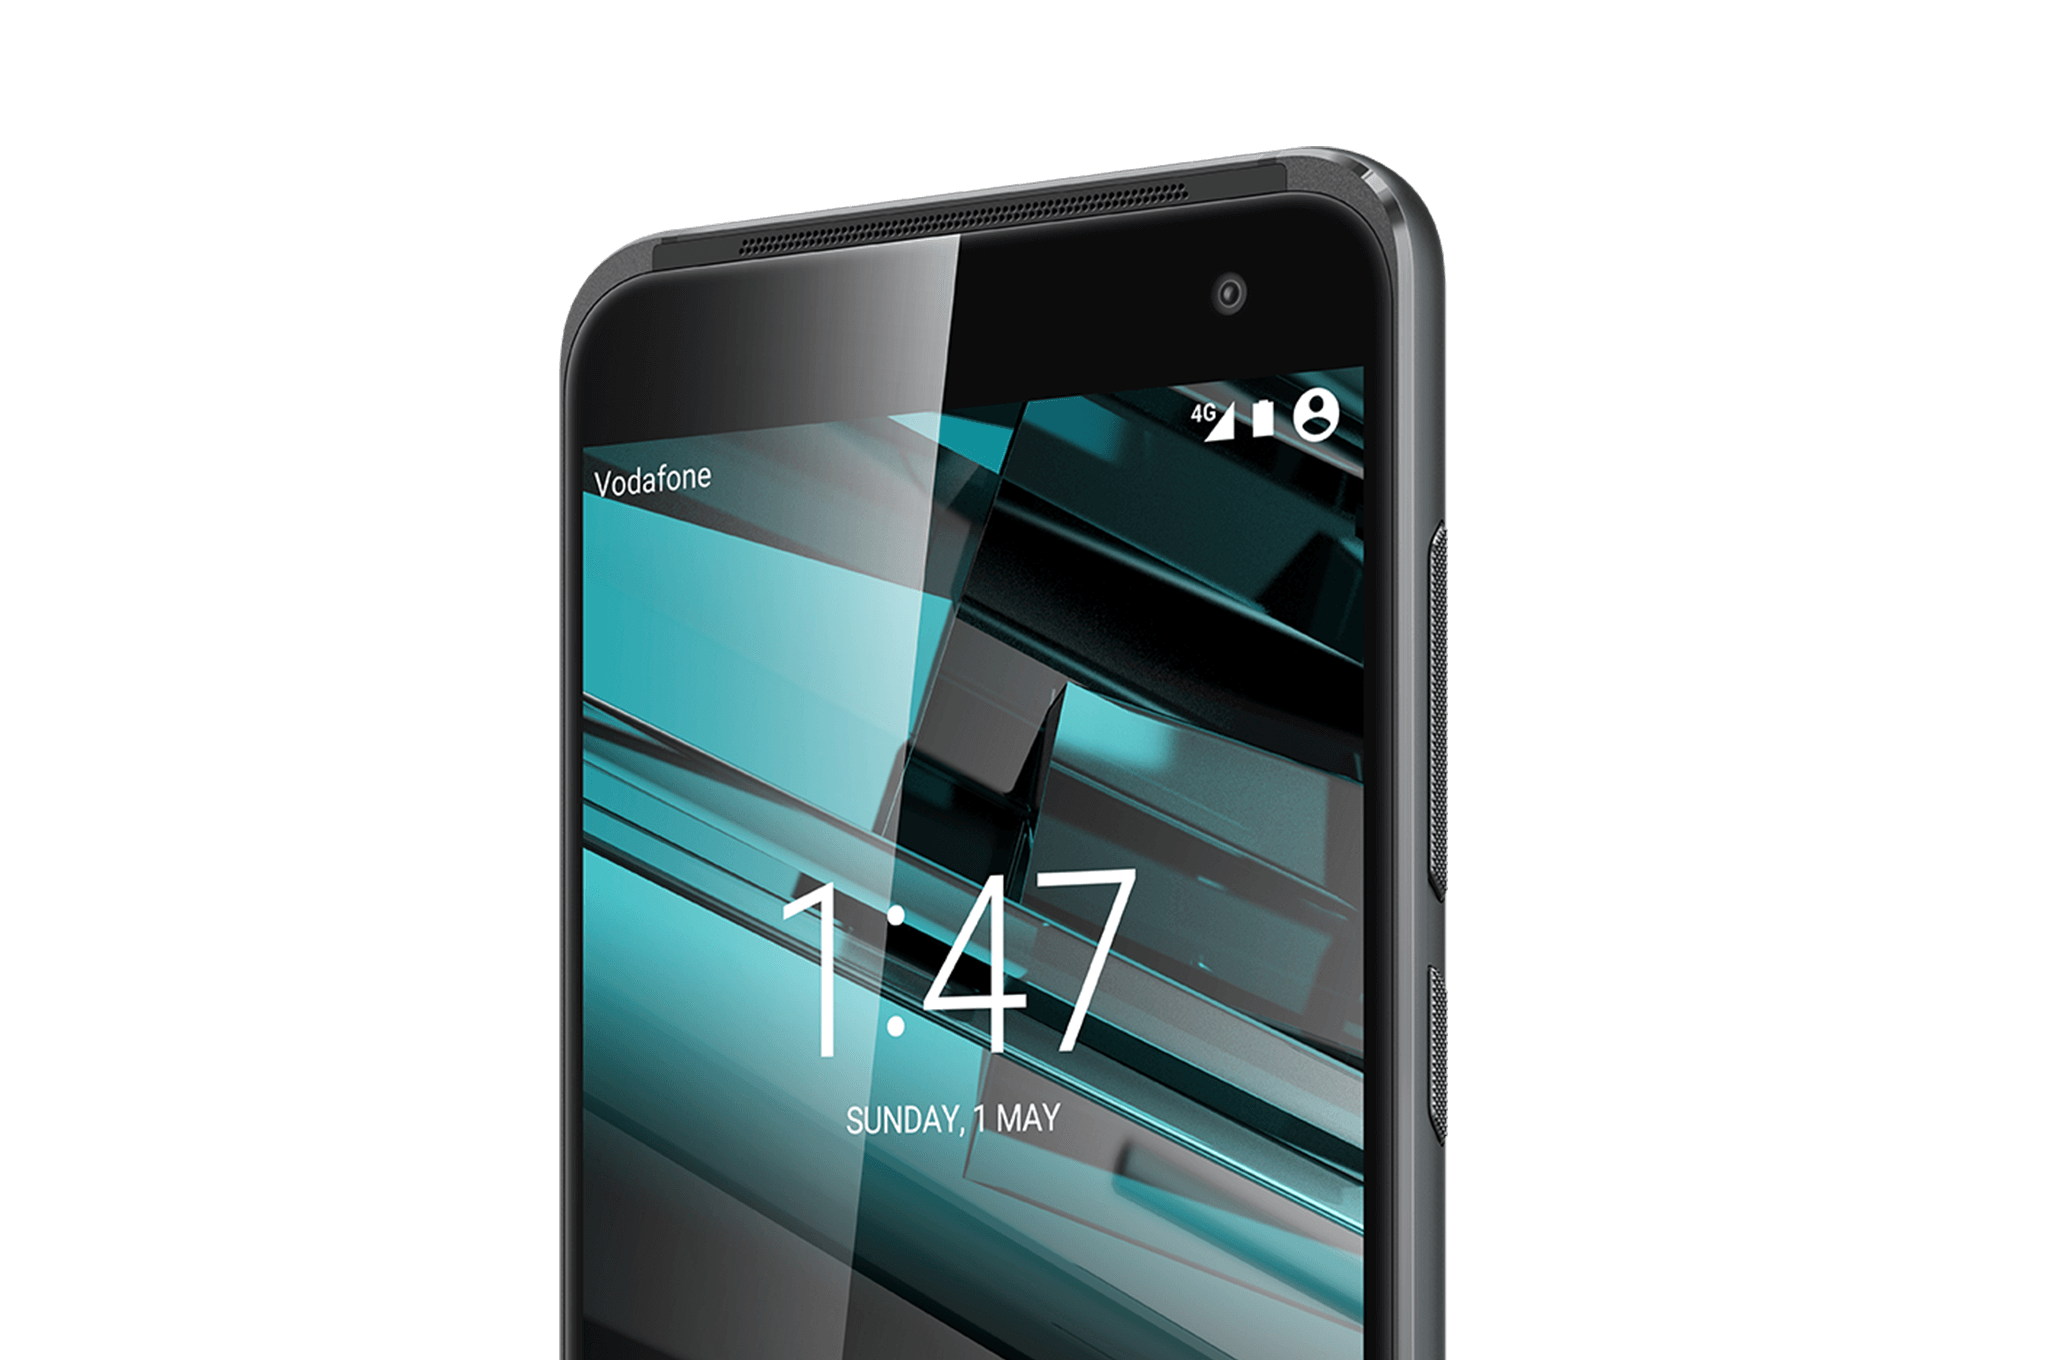 Iphone 4s Sim Karte.Multi Sim Nano Micro And Standard Sizes 3 In 1 Vodafone